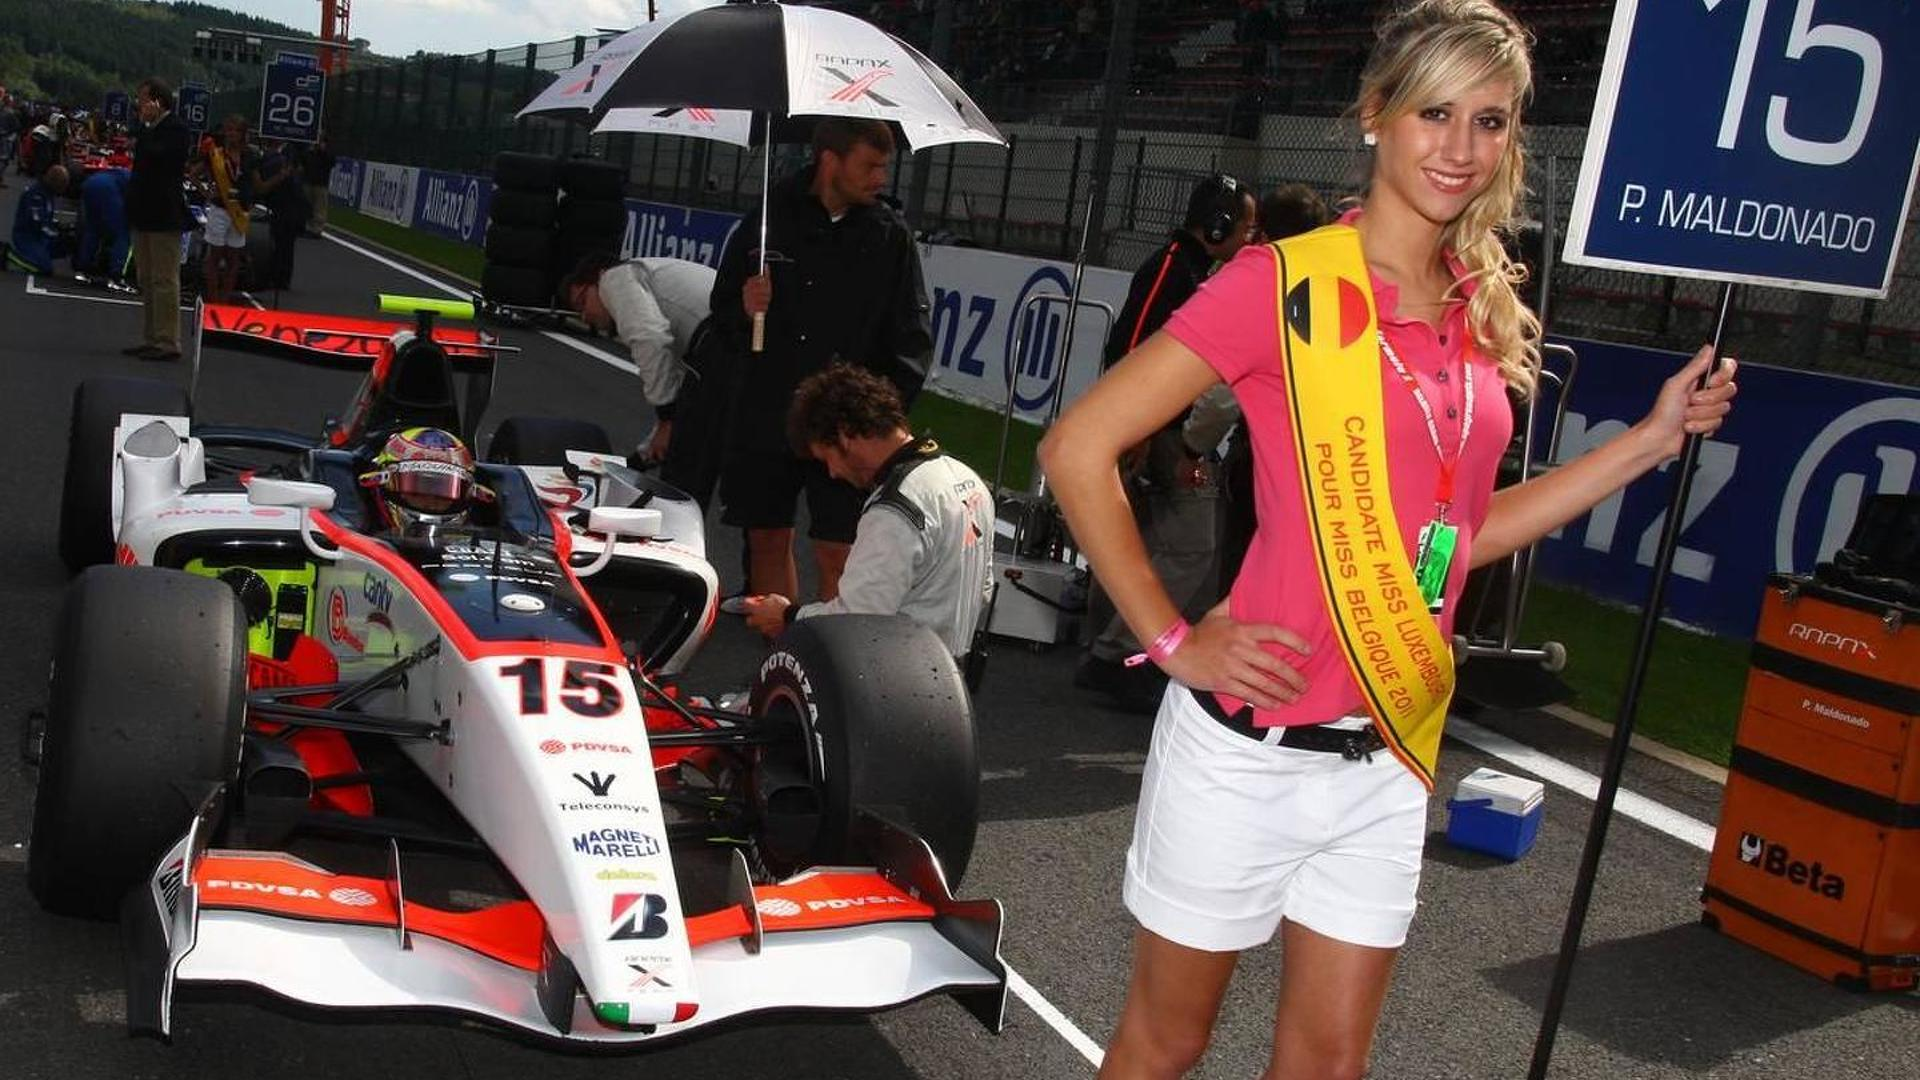 Maldonado to test HRT in Abu Dhabi